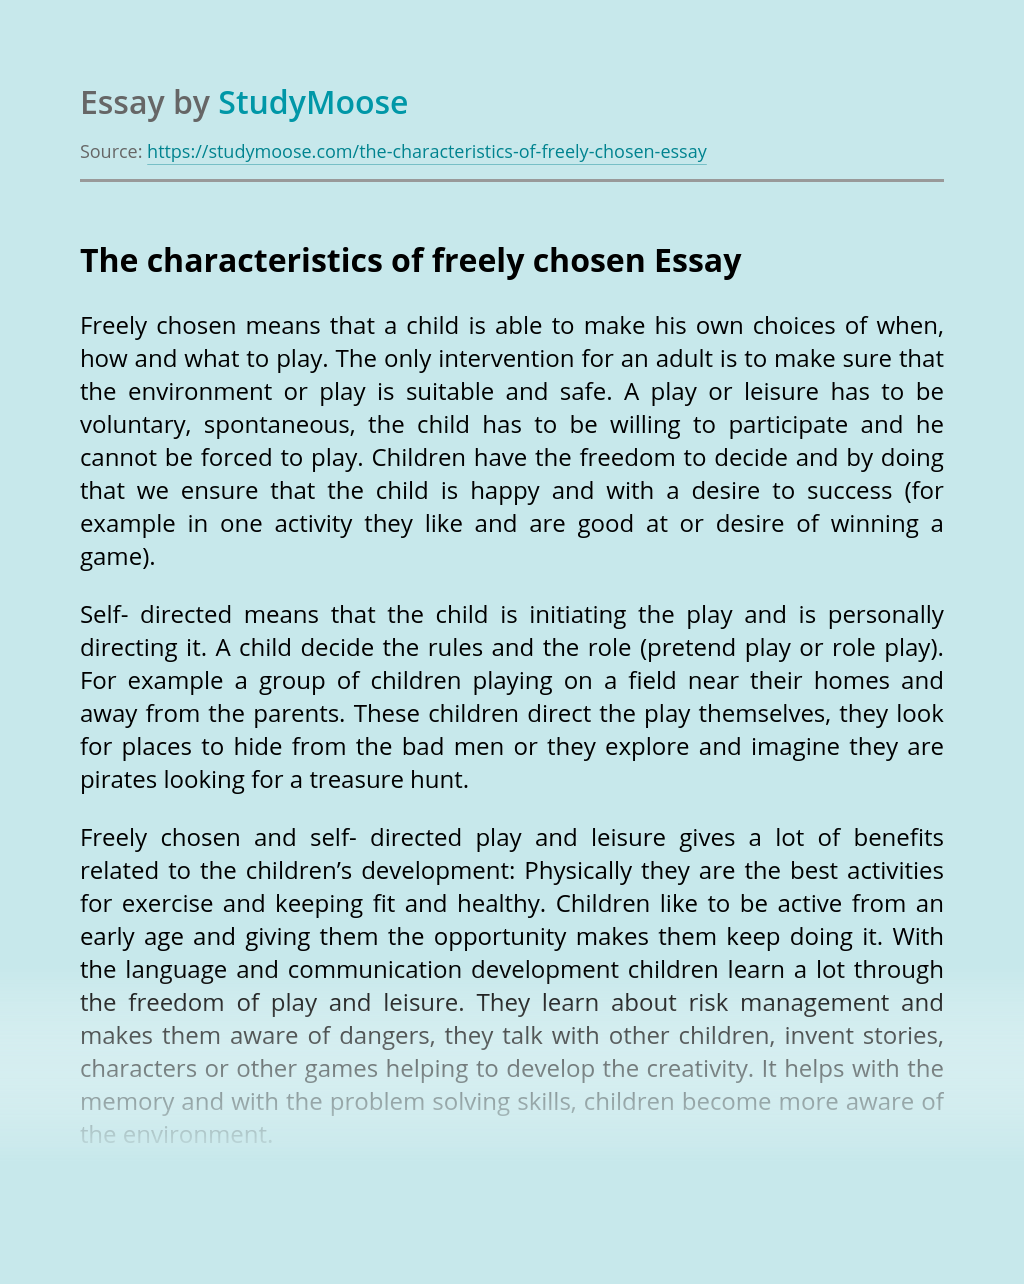 The characteristics of freely chosen